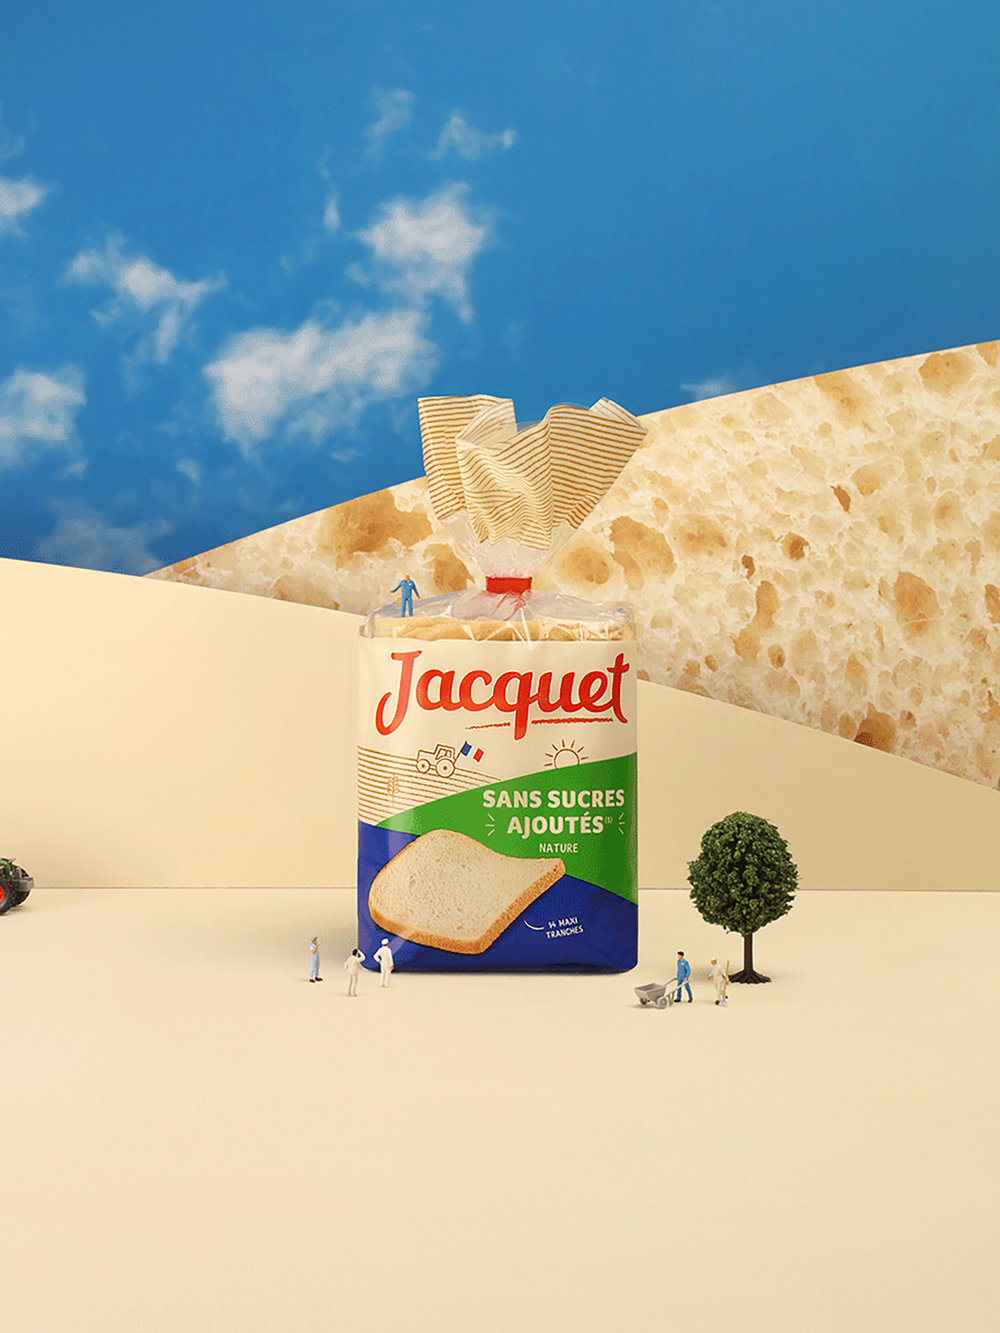 jacquet-packaging-animation-ssa-900x1200.jpg